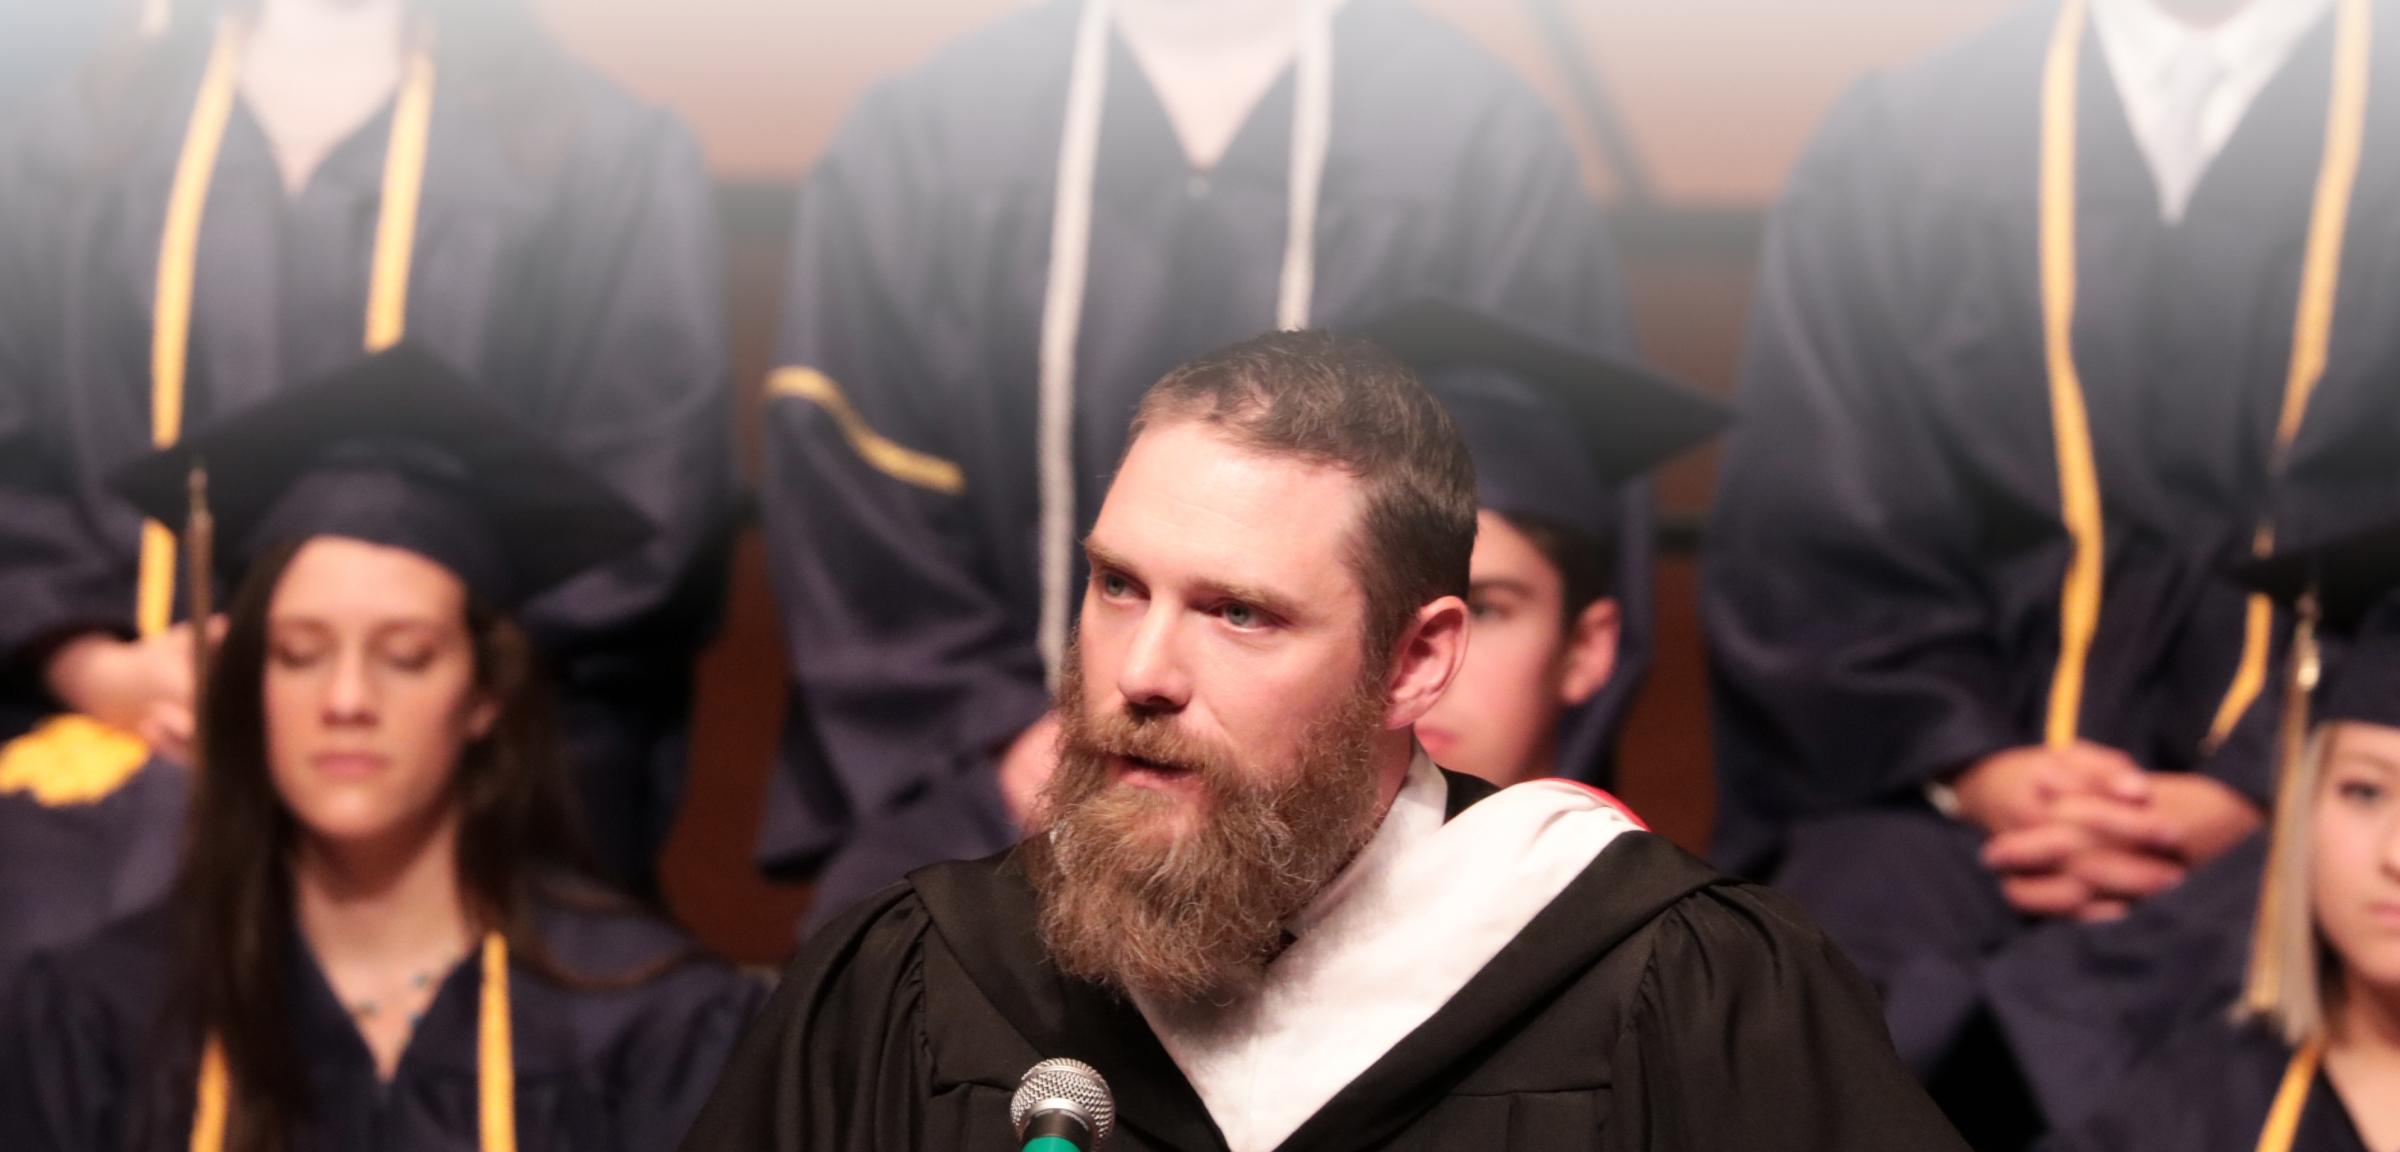 Mr. Anderson speaks at Graduation